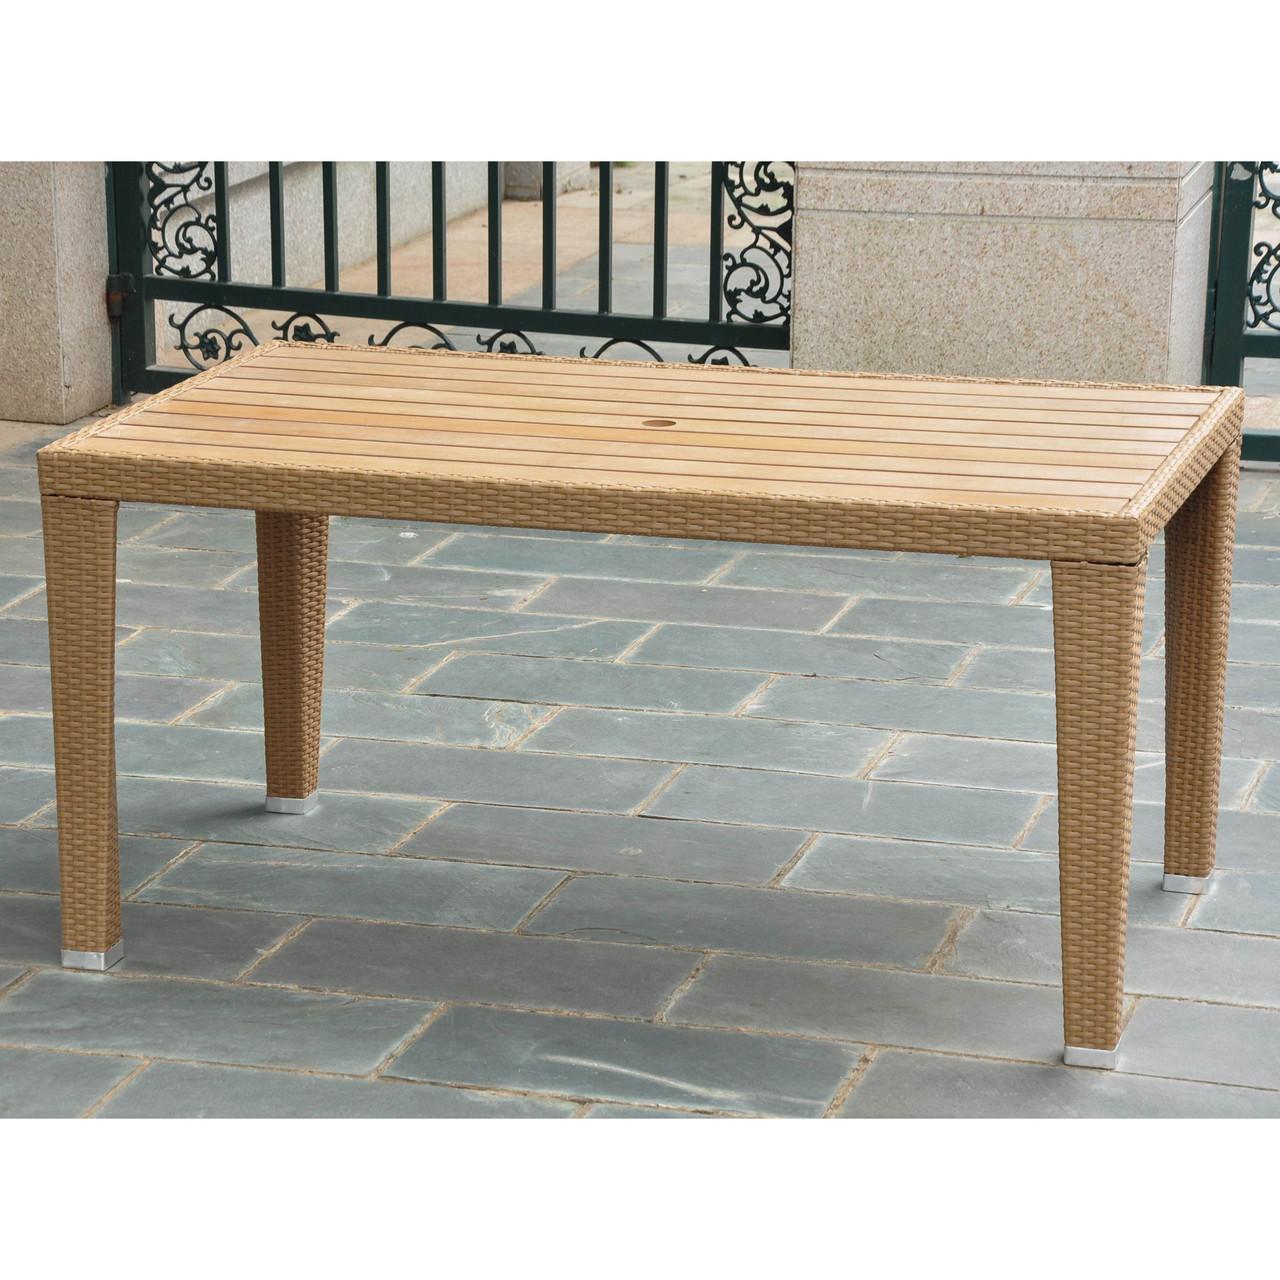 International Caravan Patio Furniture.International Caravan Barcelona Resin Wicker Aluminum Rectangular Dining Table